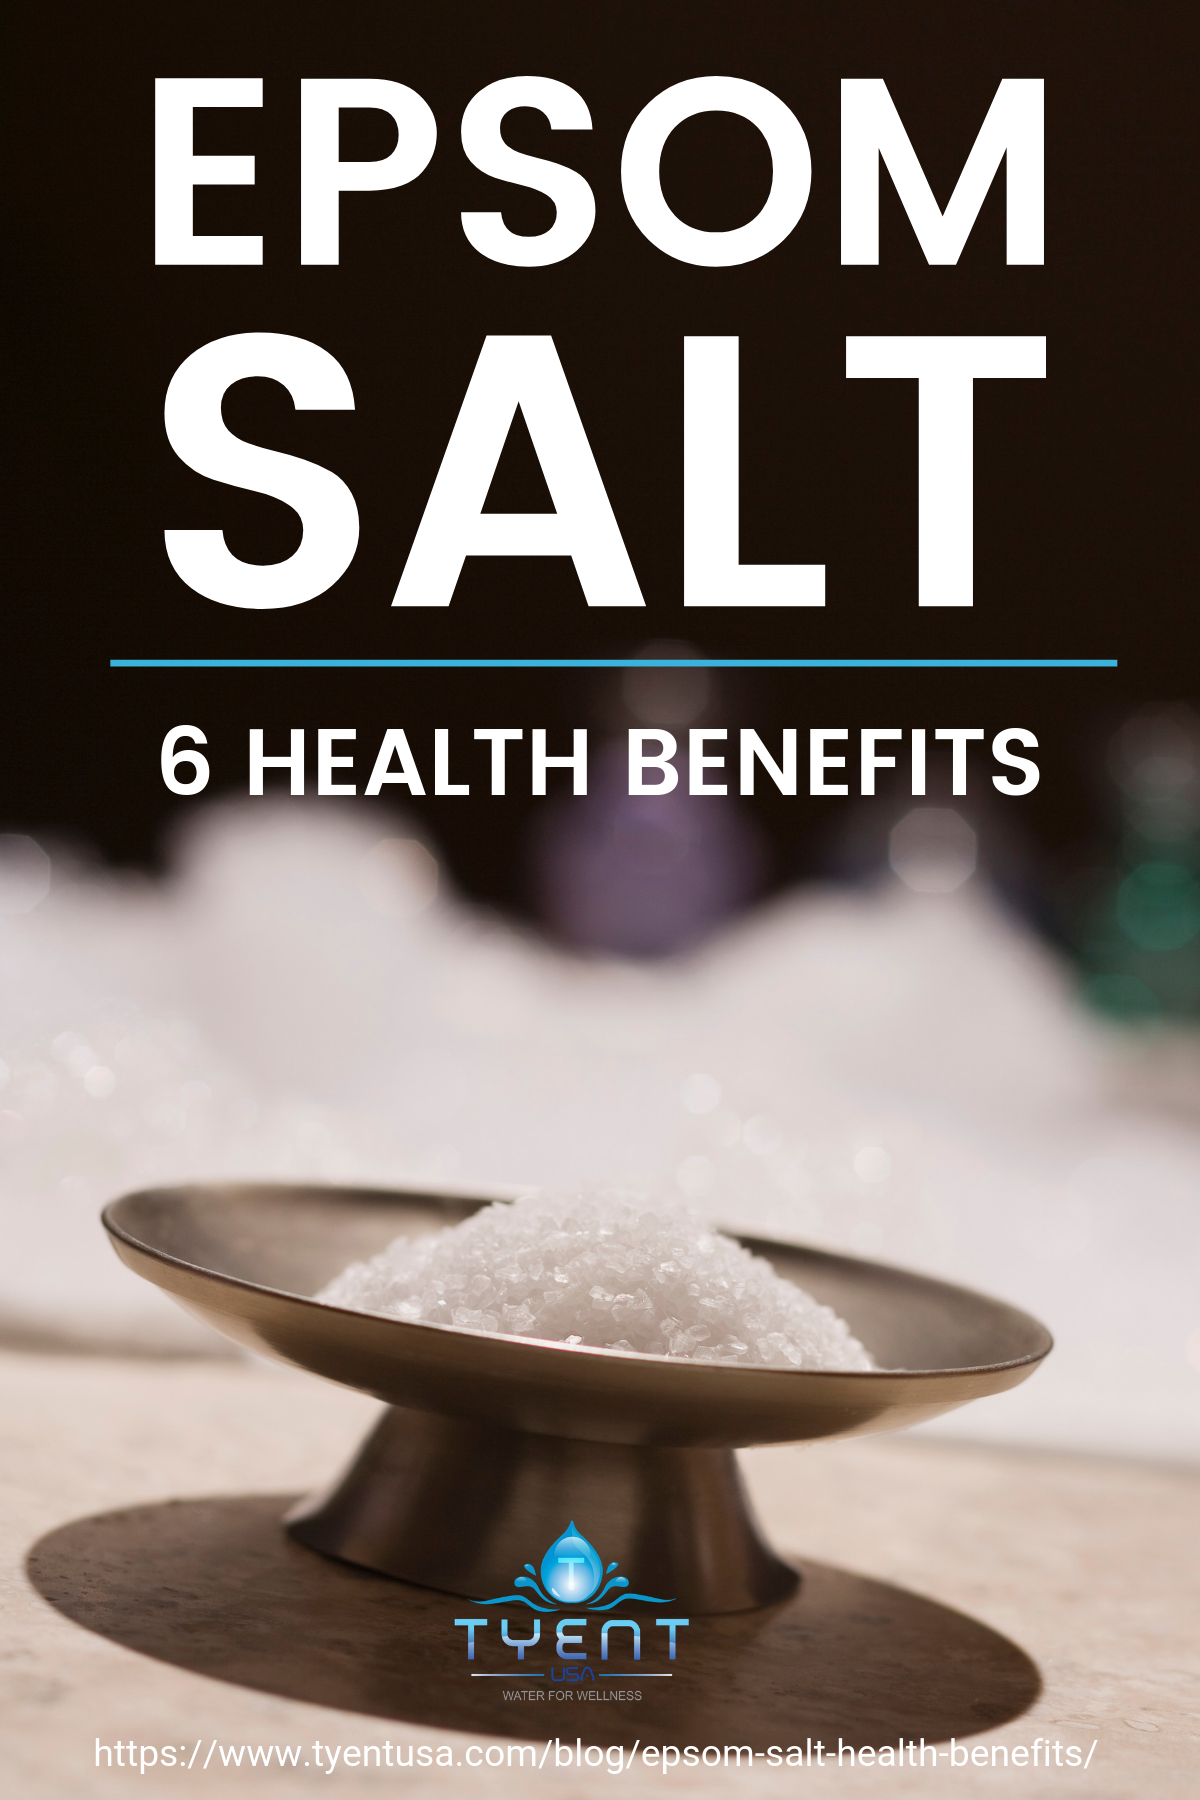 Epsom Salt: 6 Health Benefits https://www.tyentusa.com/blog/epsom-salt-health-benefits/